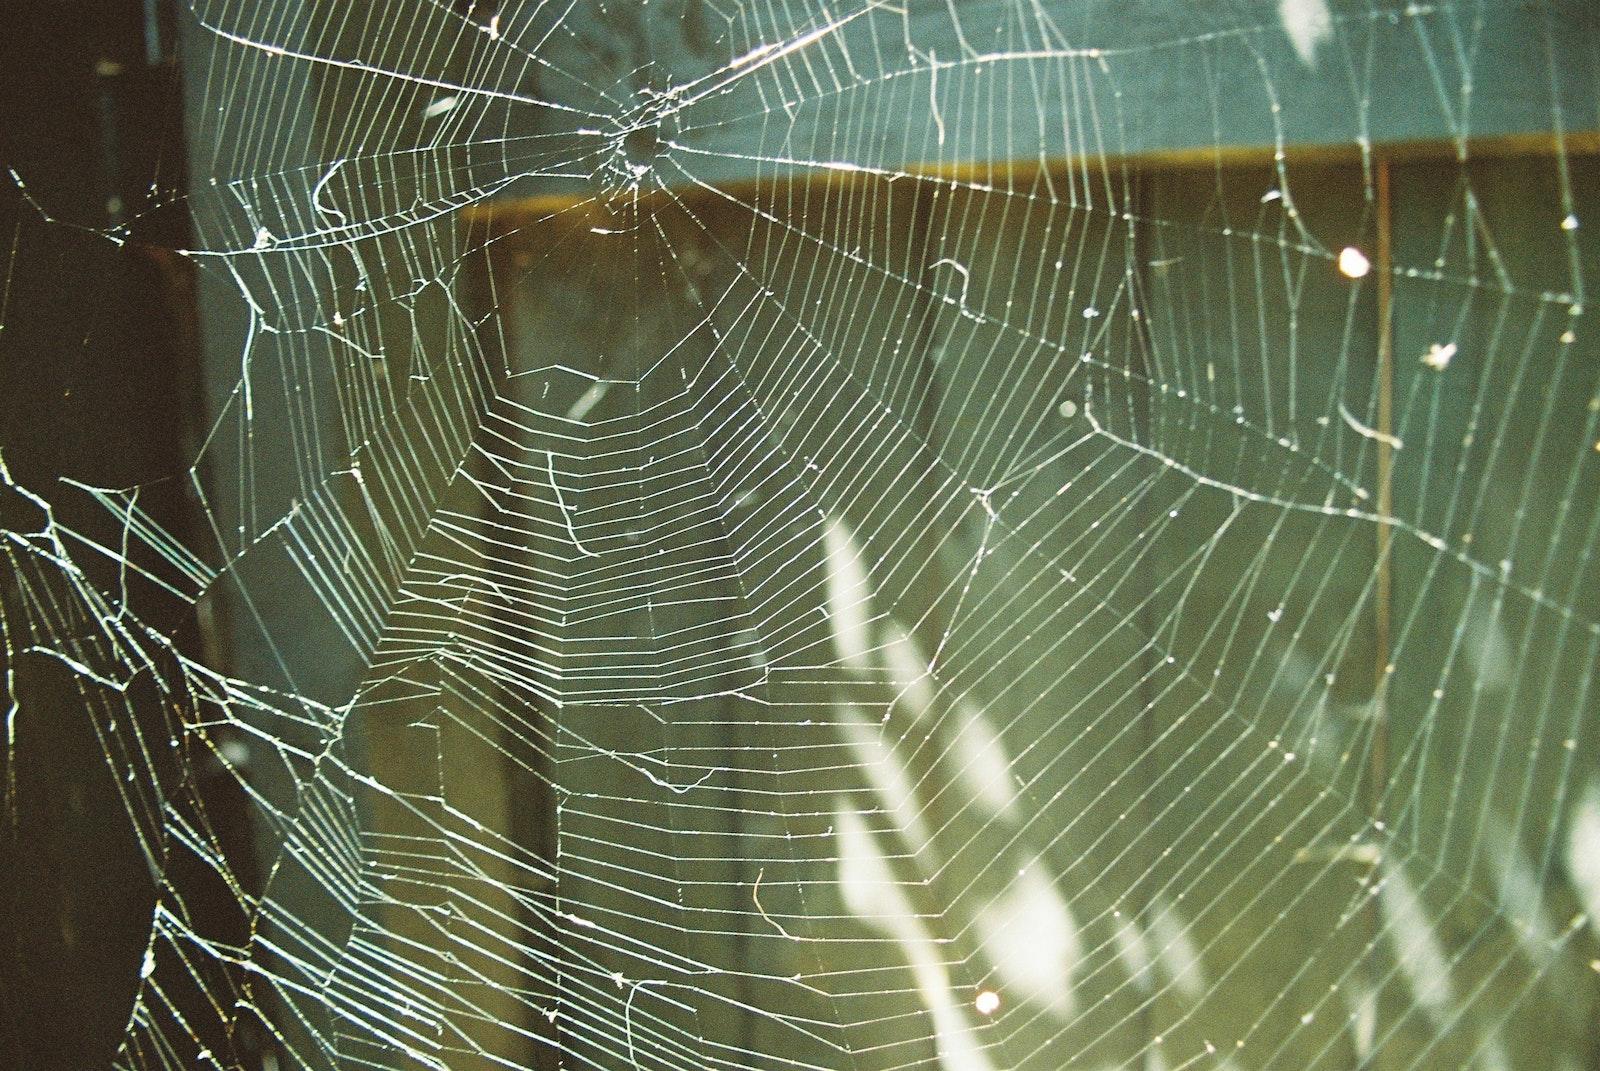 A spiderweb lit by sun